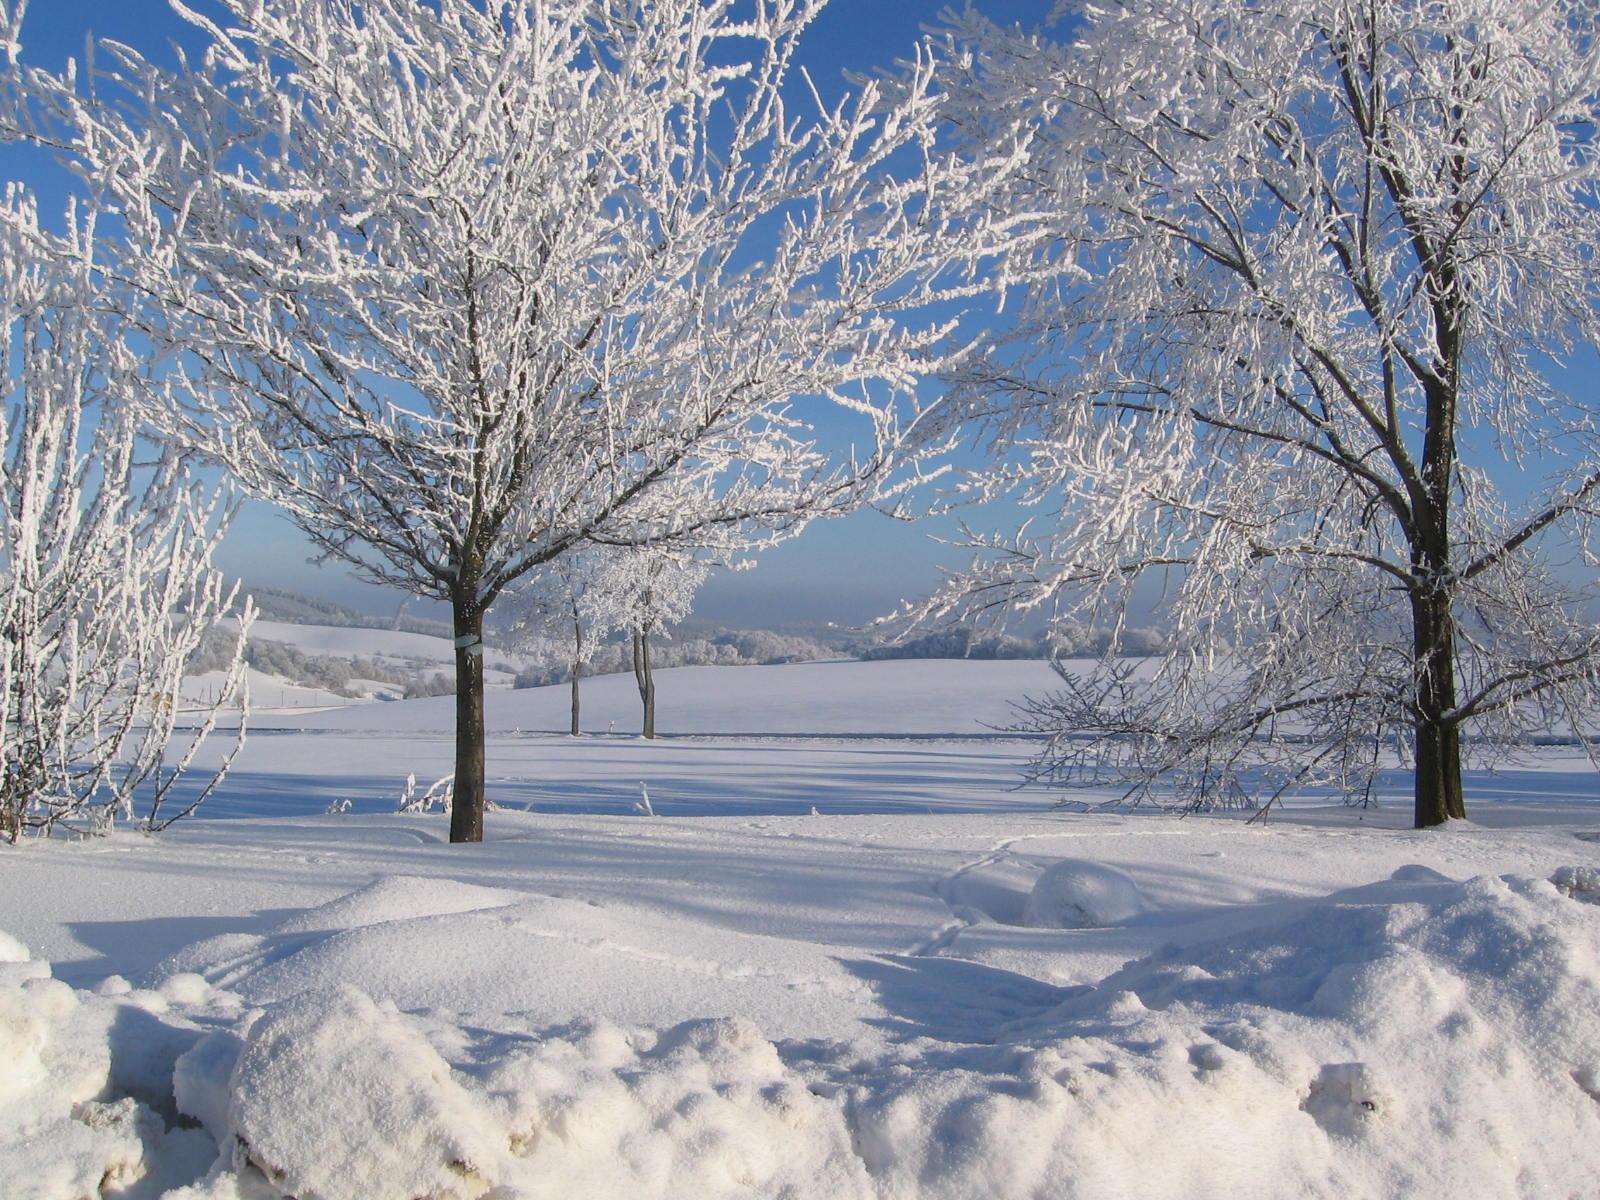 Winter zum Jahresanfang